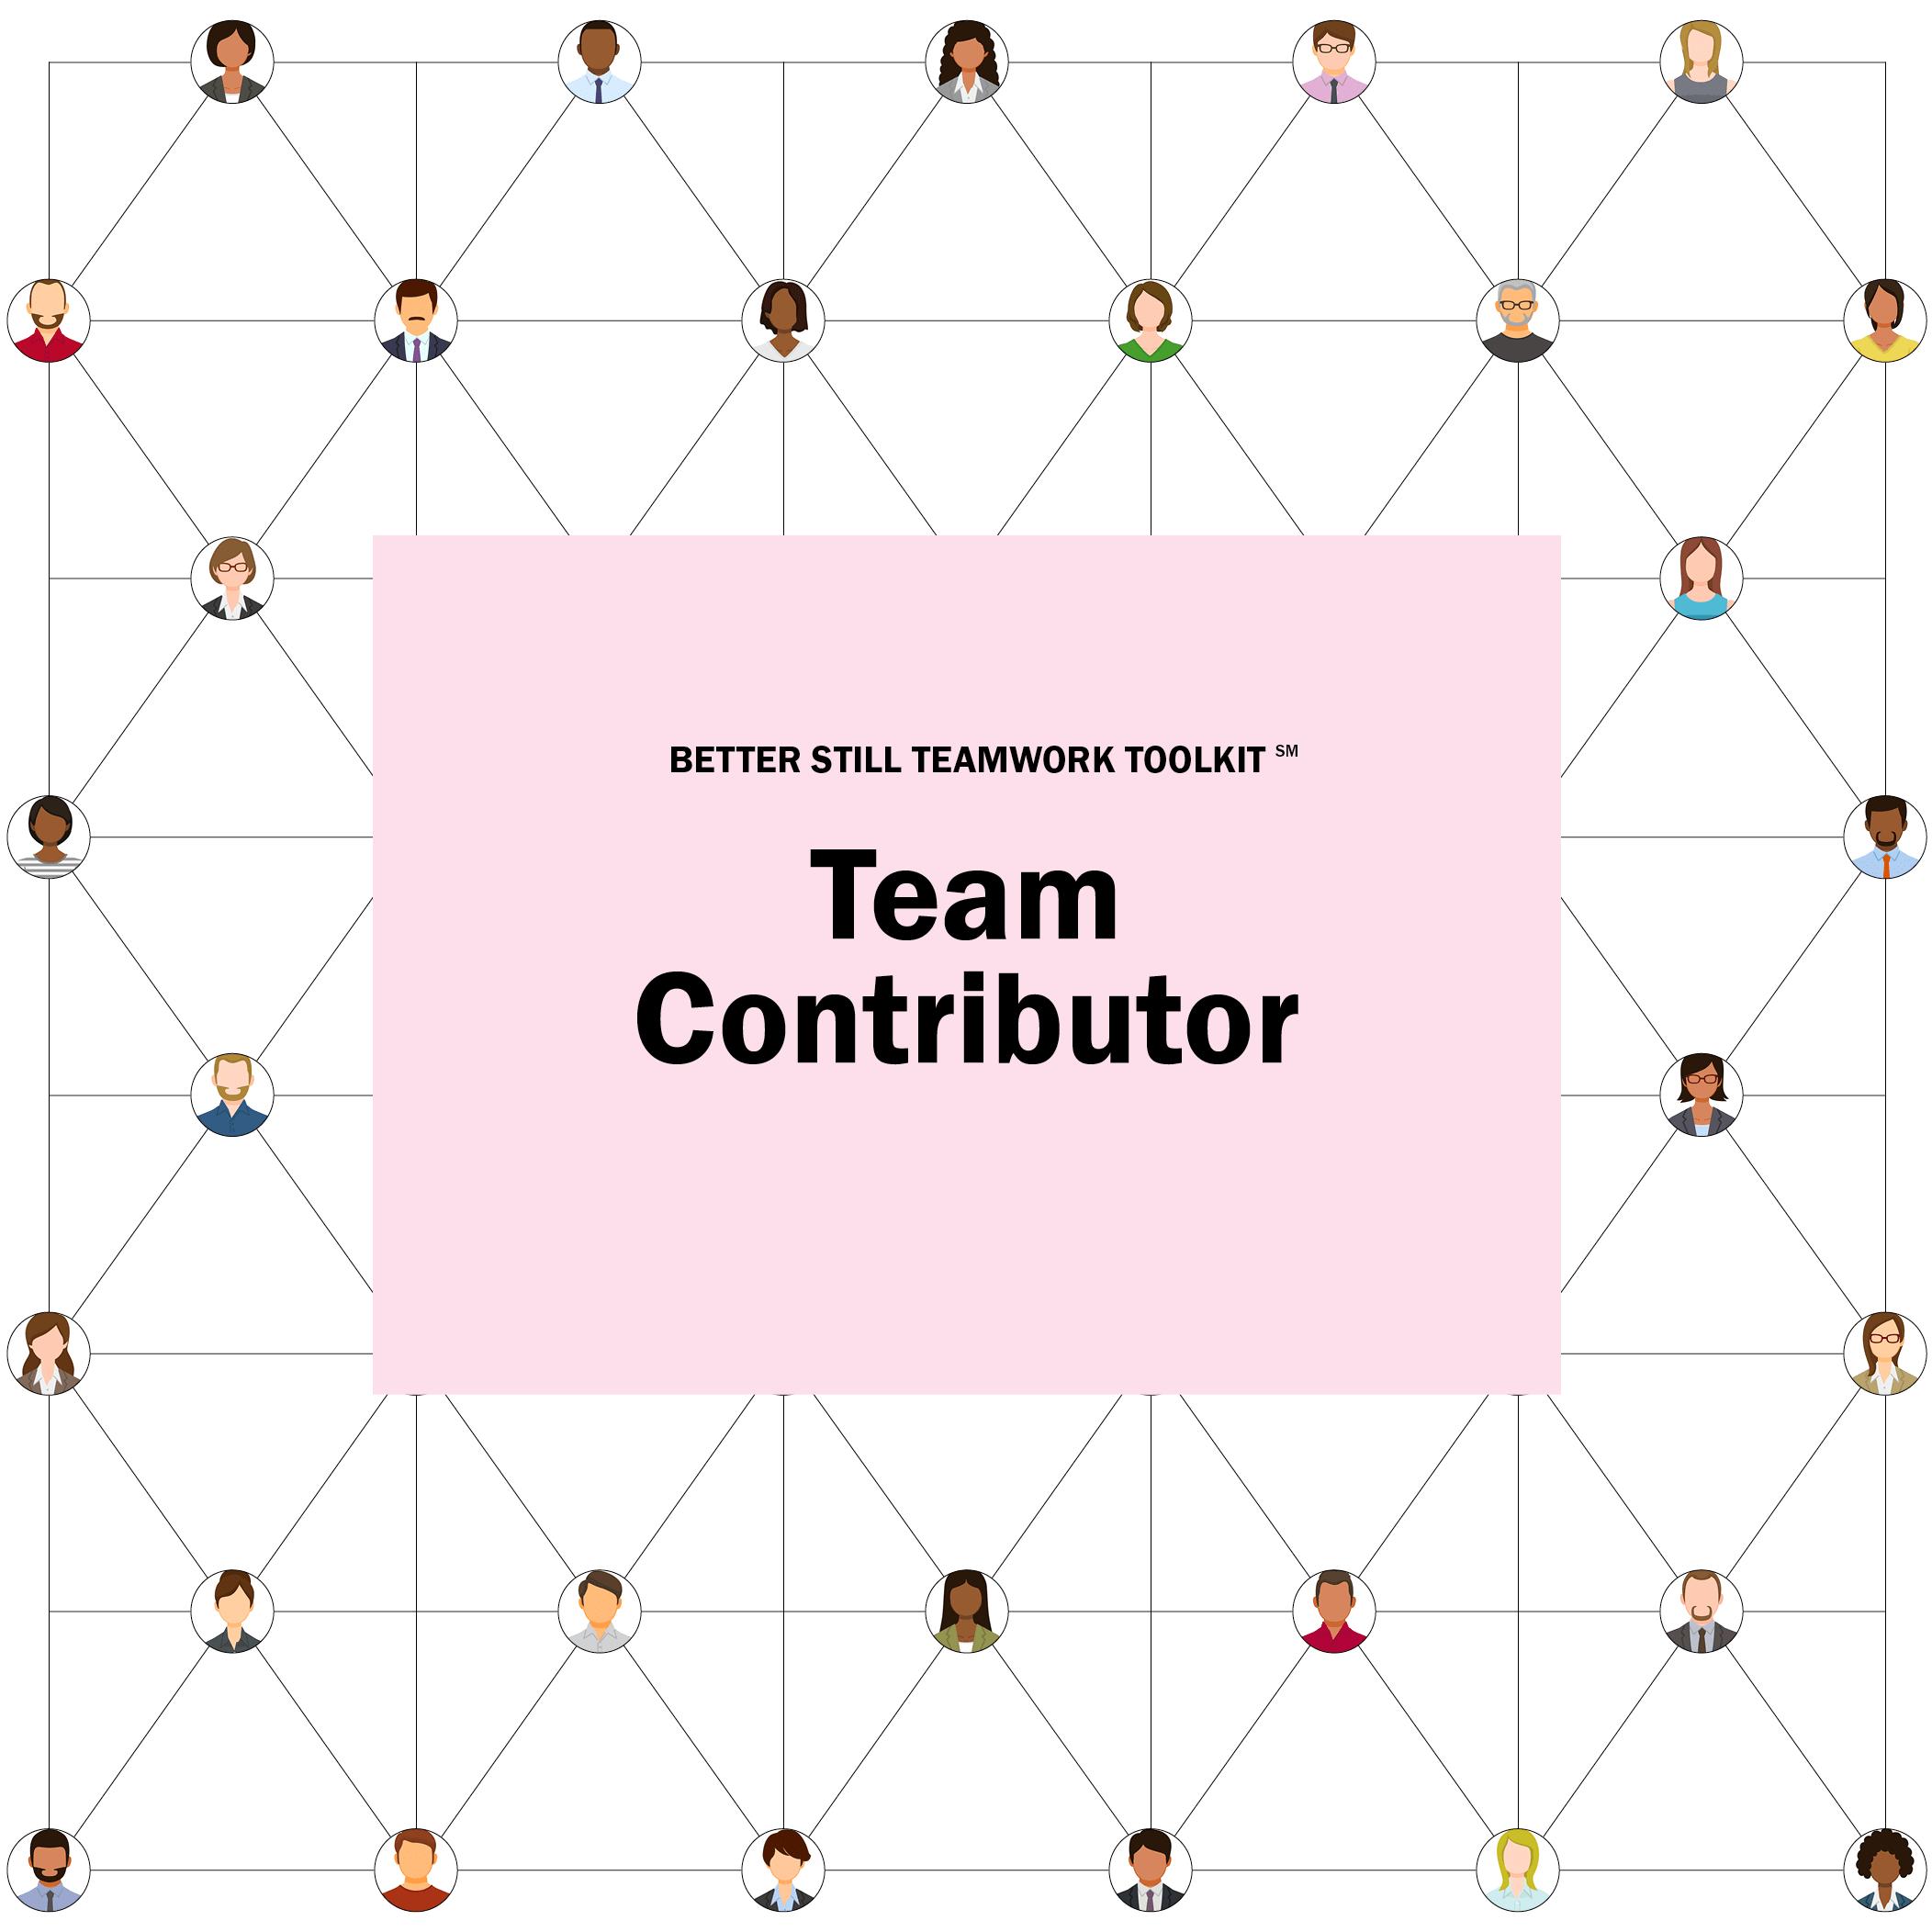 Team Contributor Toolkit